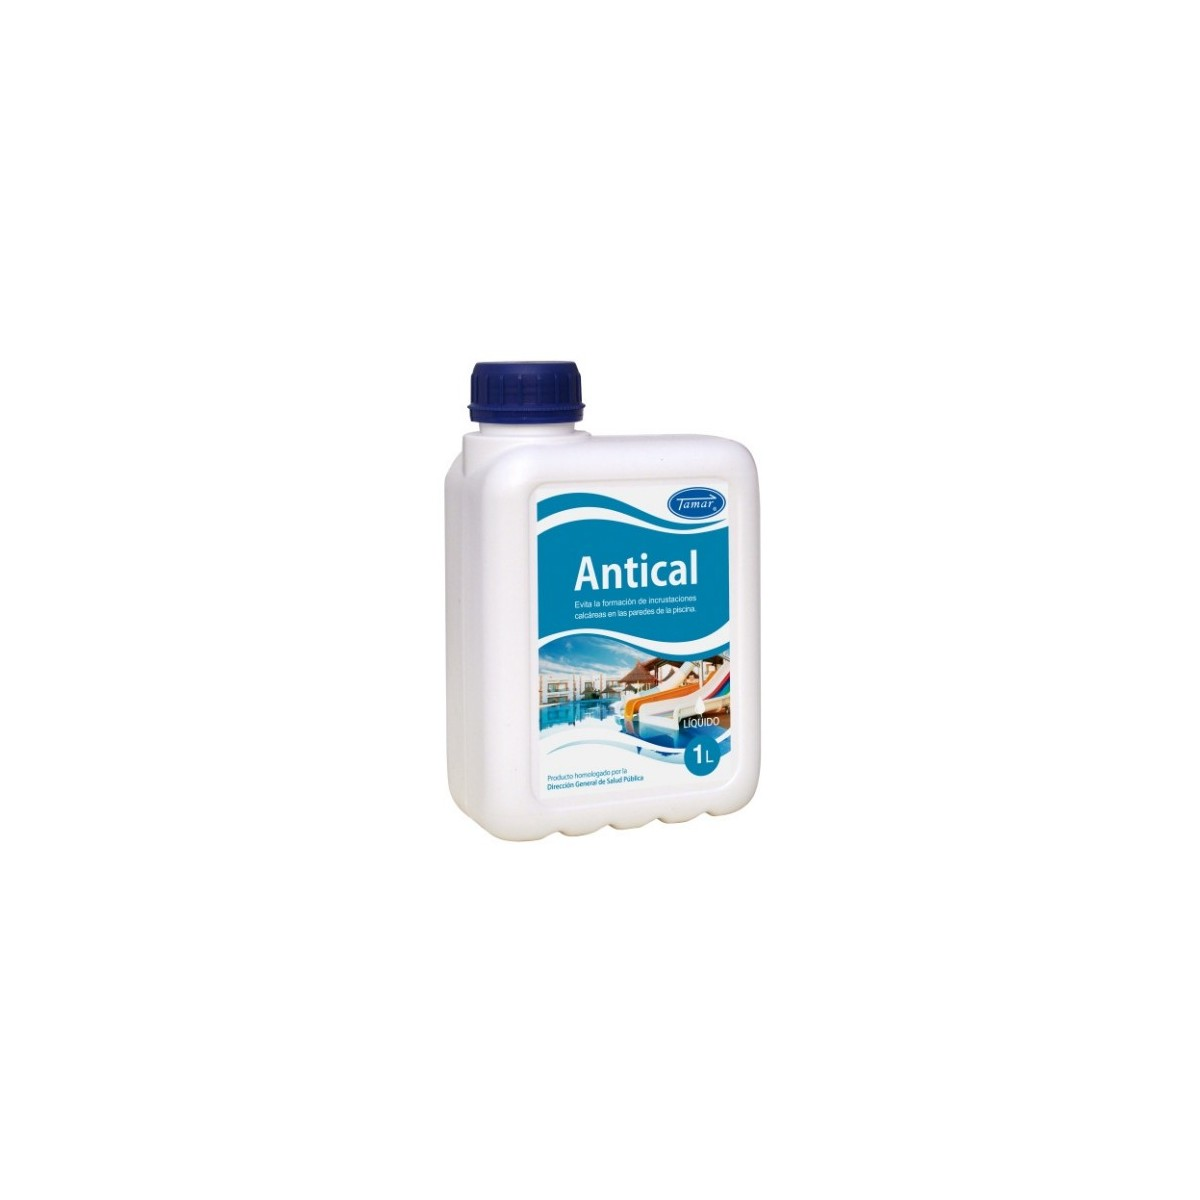 Antical liquido 5l